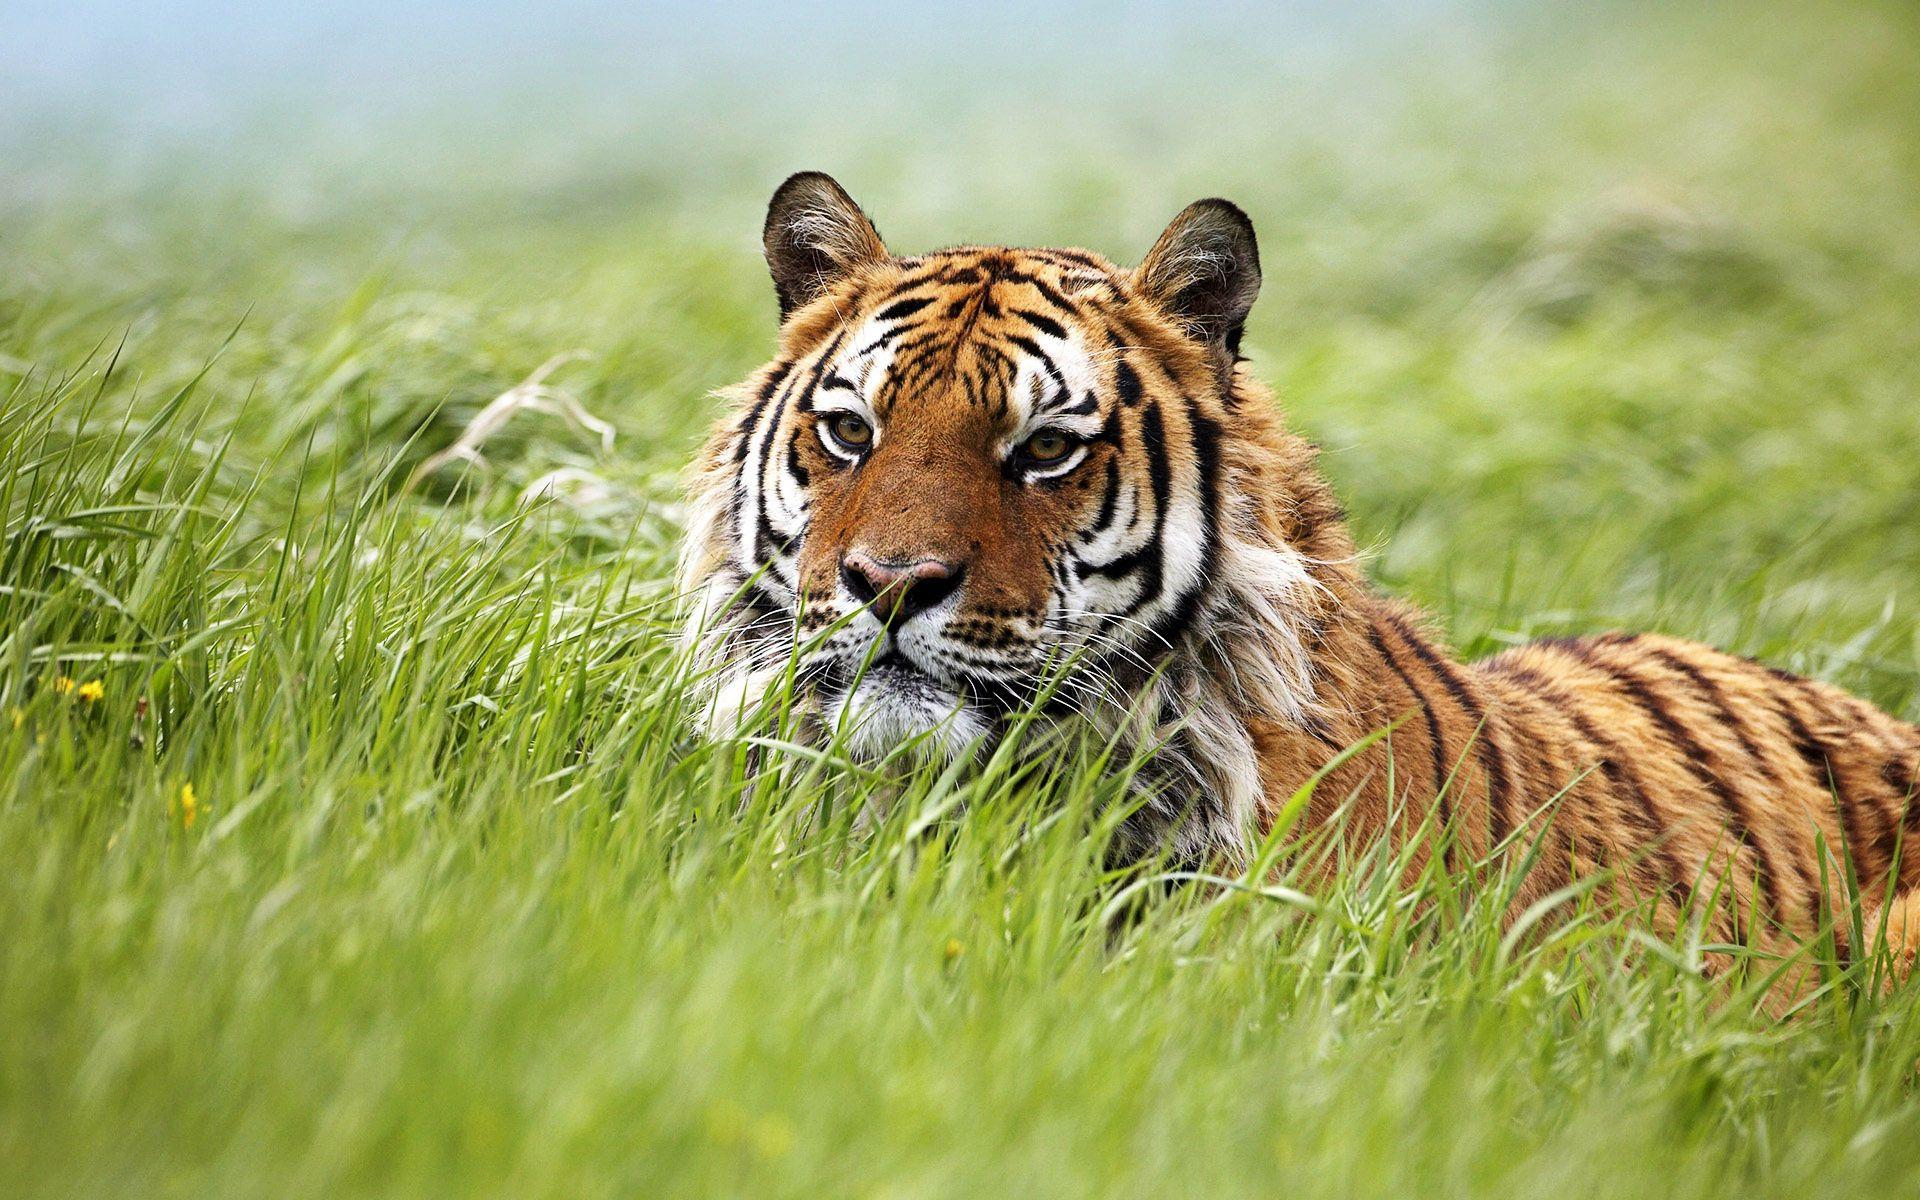 Hd Siberian Tiger Wallpaper Download Free 115201 Siberian Tiger Tiger Wallpaper Tiger